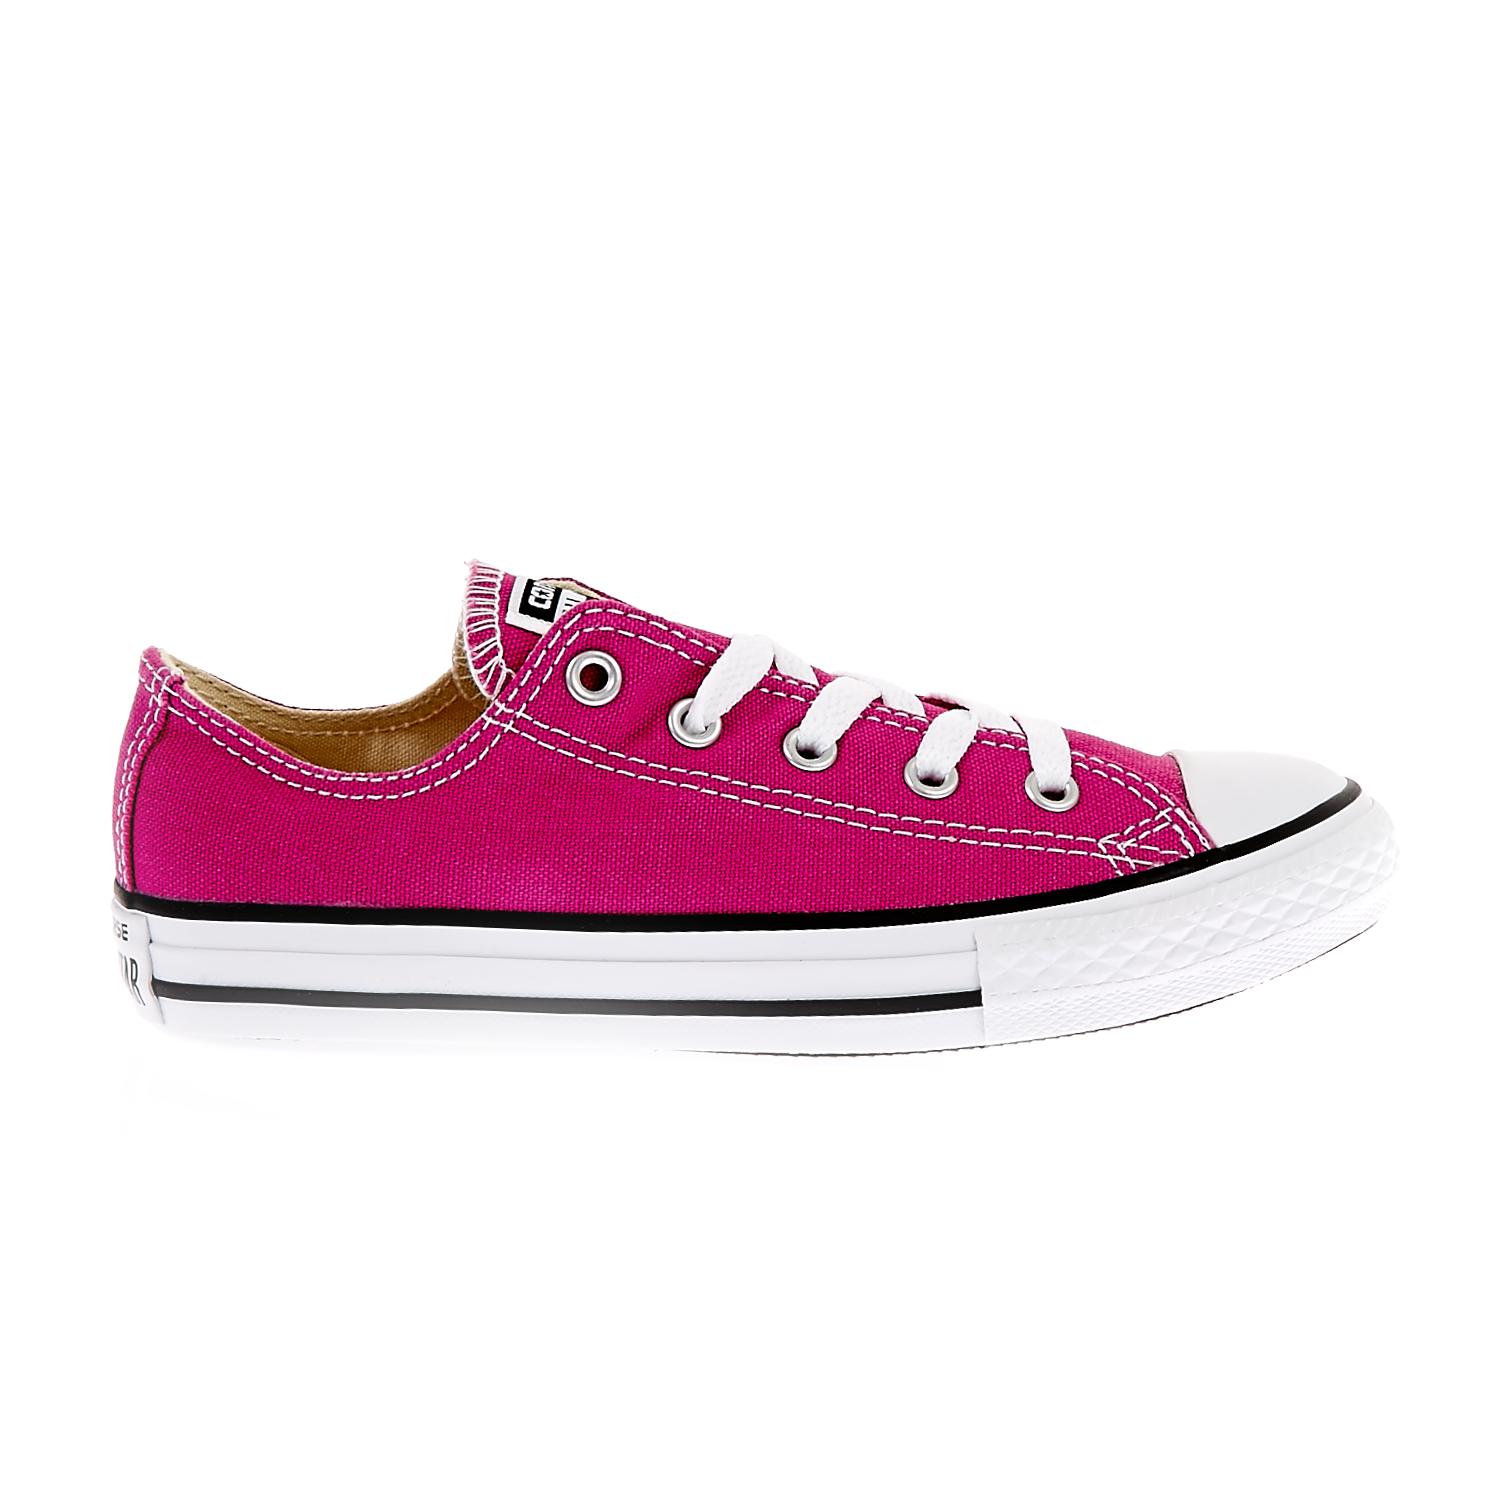 CONVERSE – Παιδικά παπούτσια Chuck Taylor All Star Ox φούξια